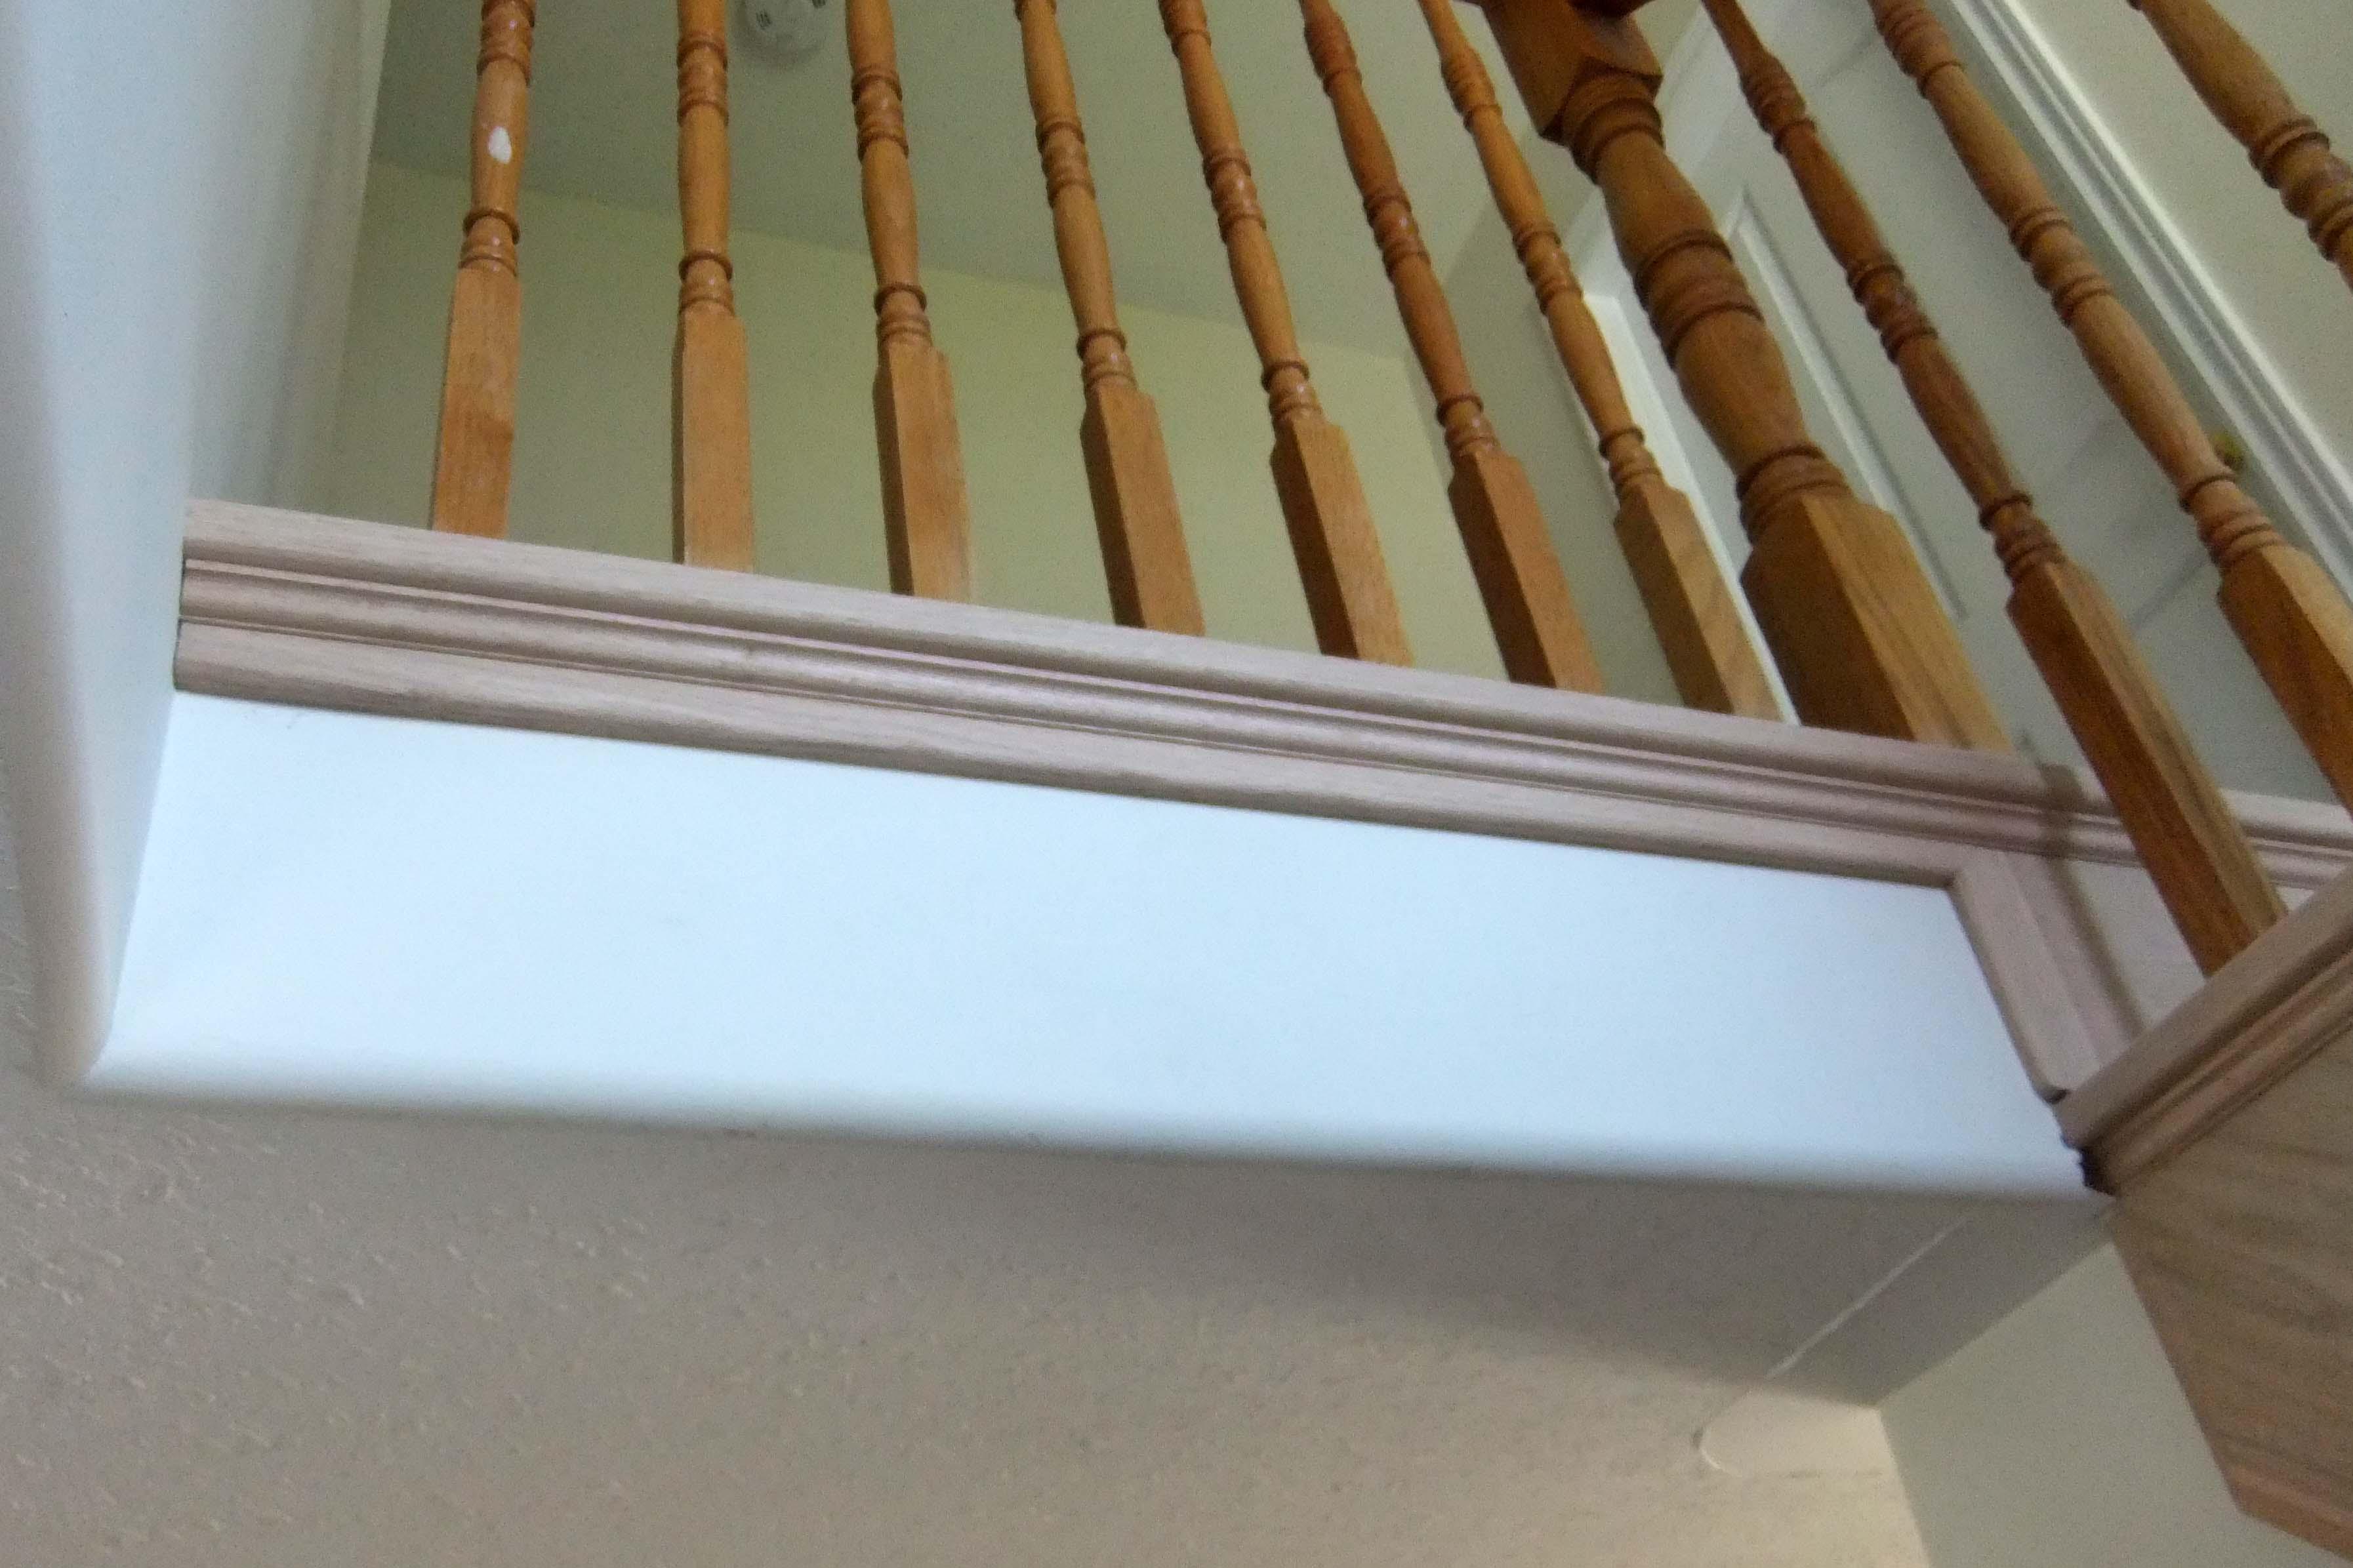 Nosing next to drywall